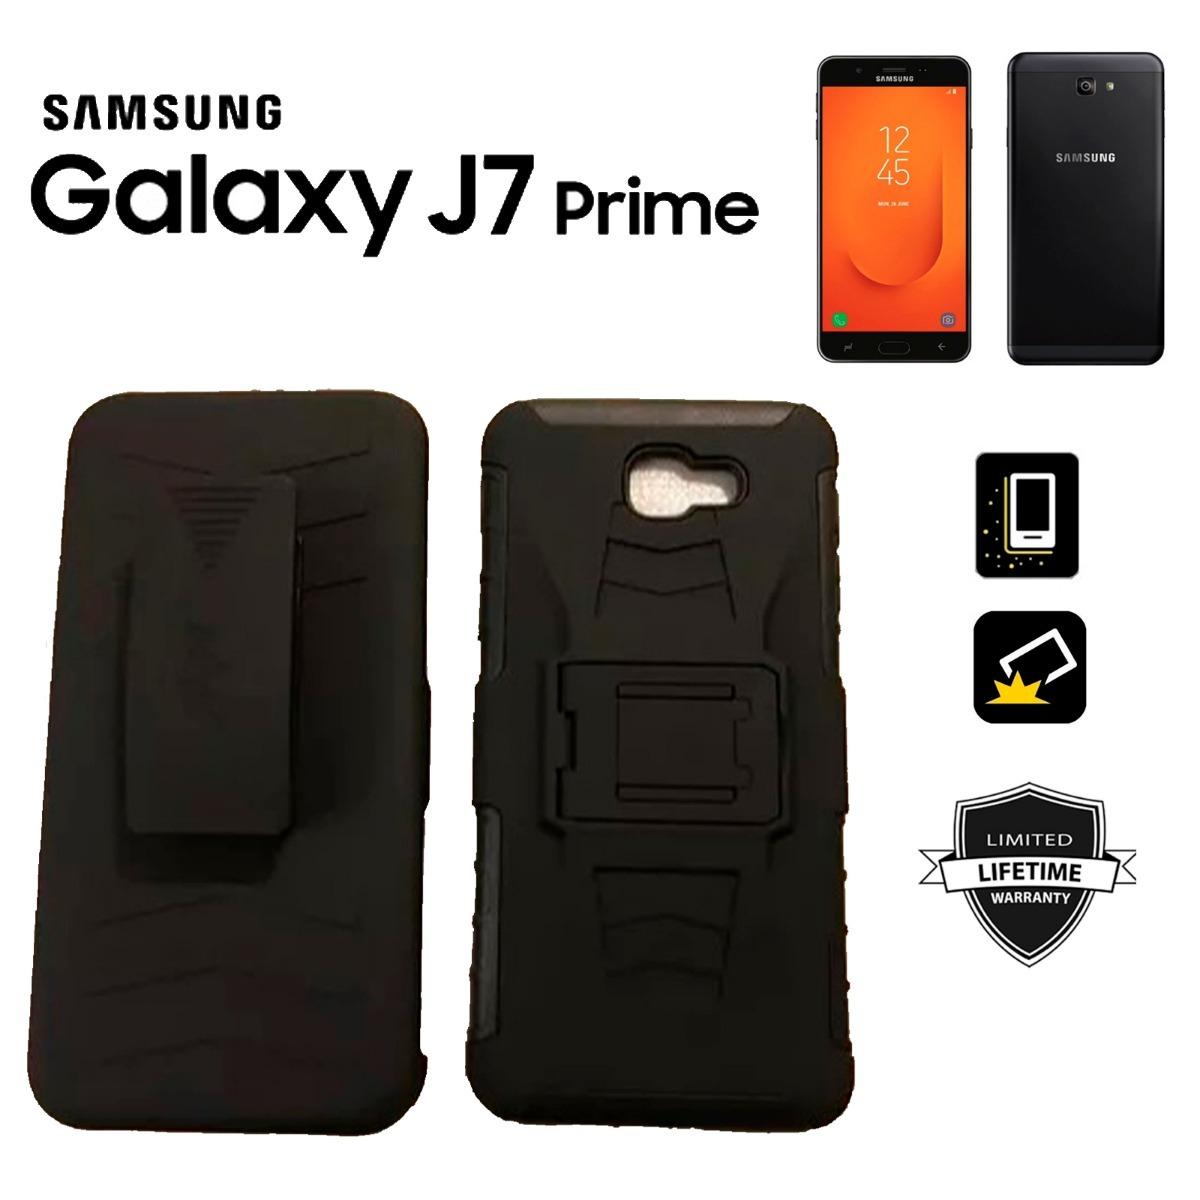 93151b04f33 estuche samsung galaxy j7 prime robot gancho holster carcasa. Cargando zoom.